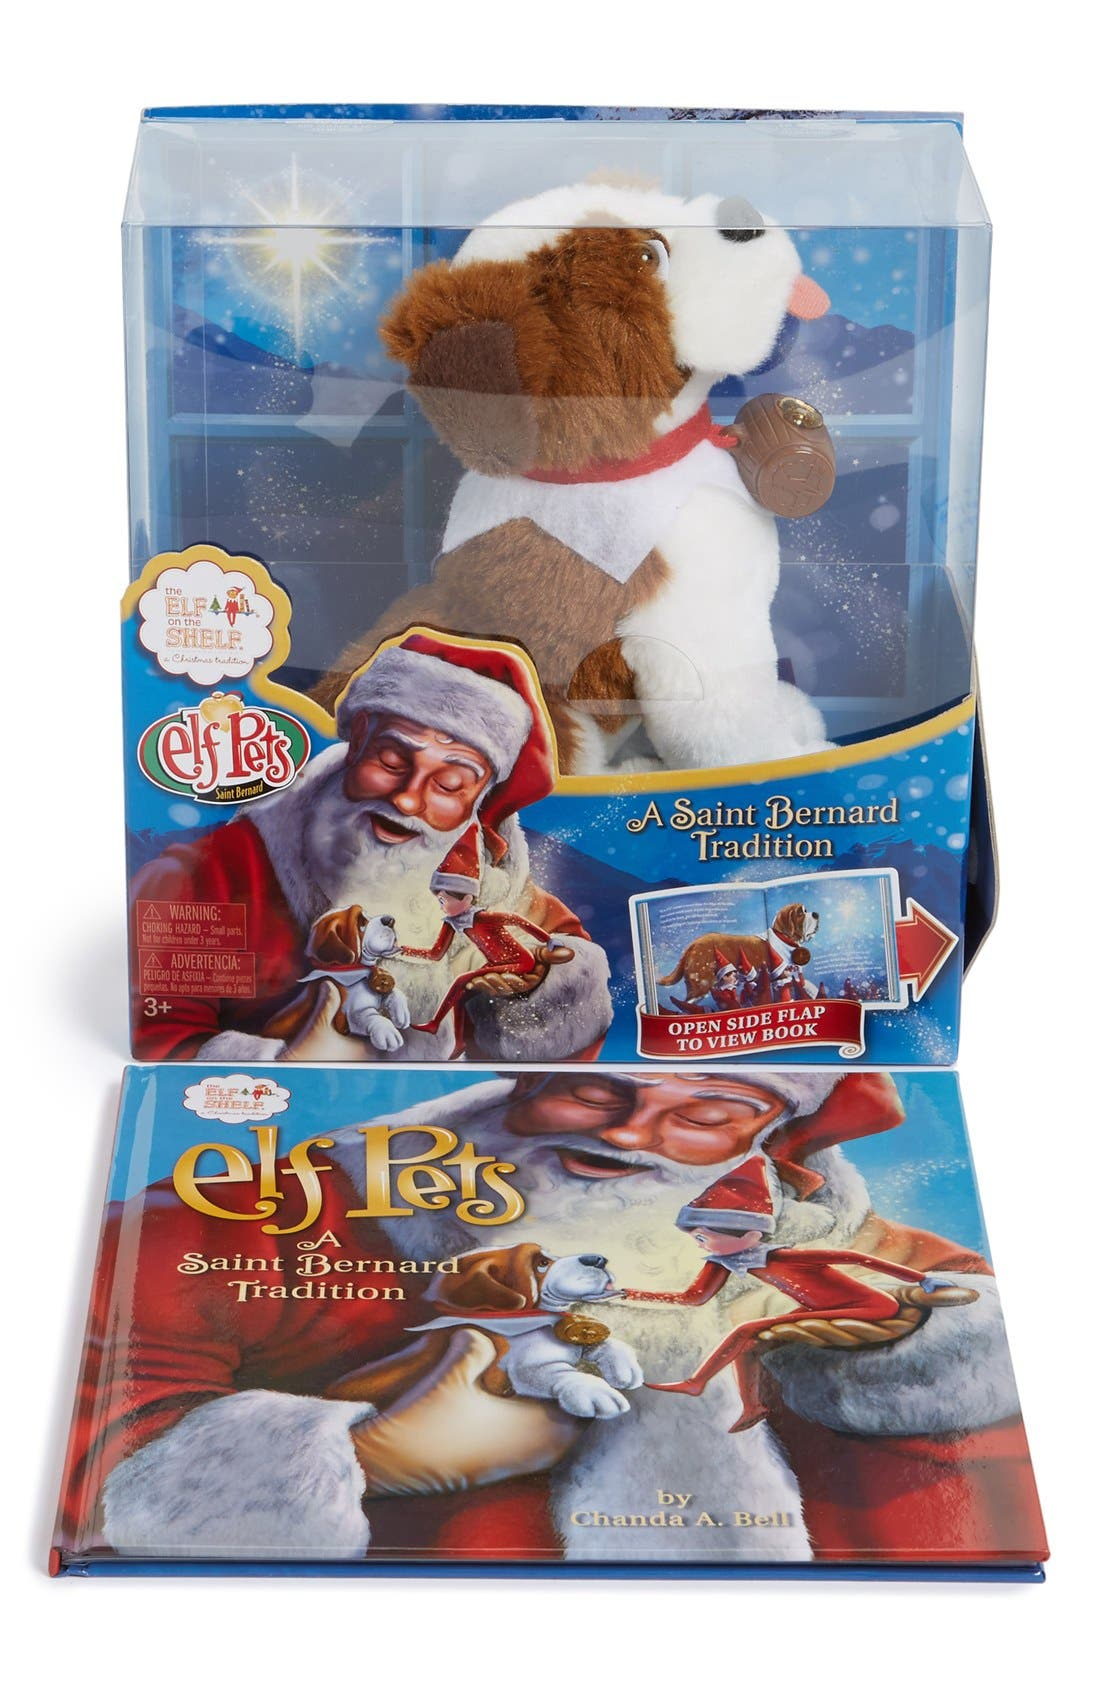 Elf on the Shelf Elf Pets®: A Saint Bernard Tradition Book & Stuffed Animal